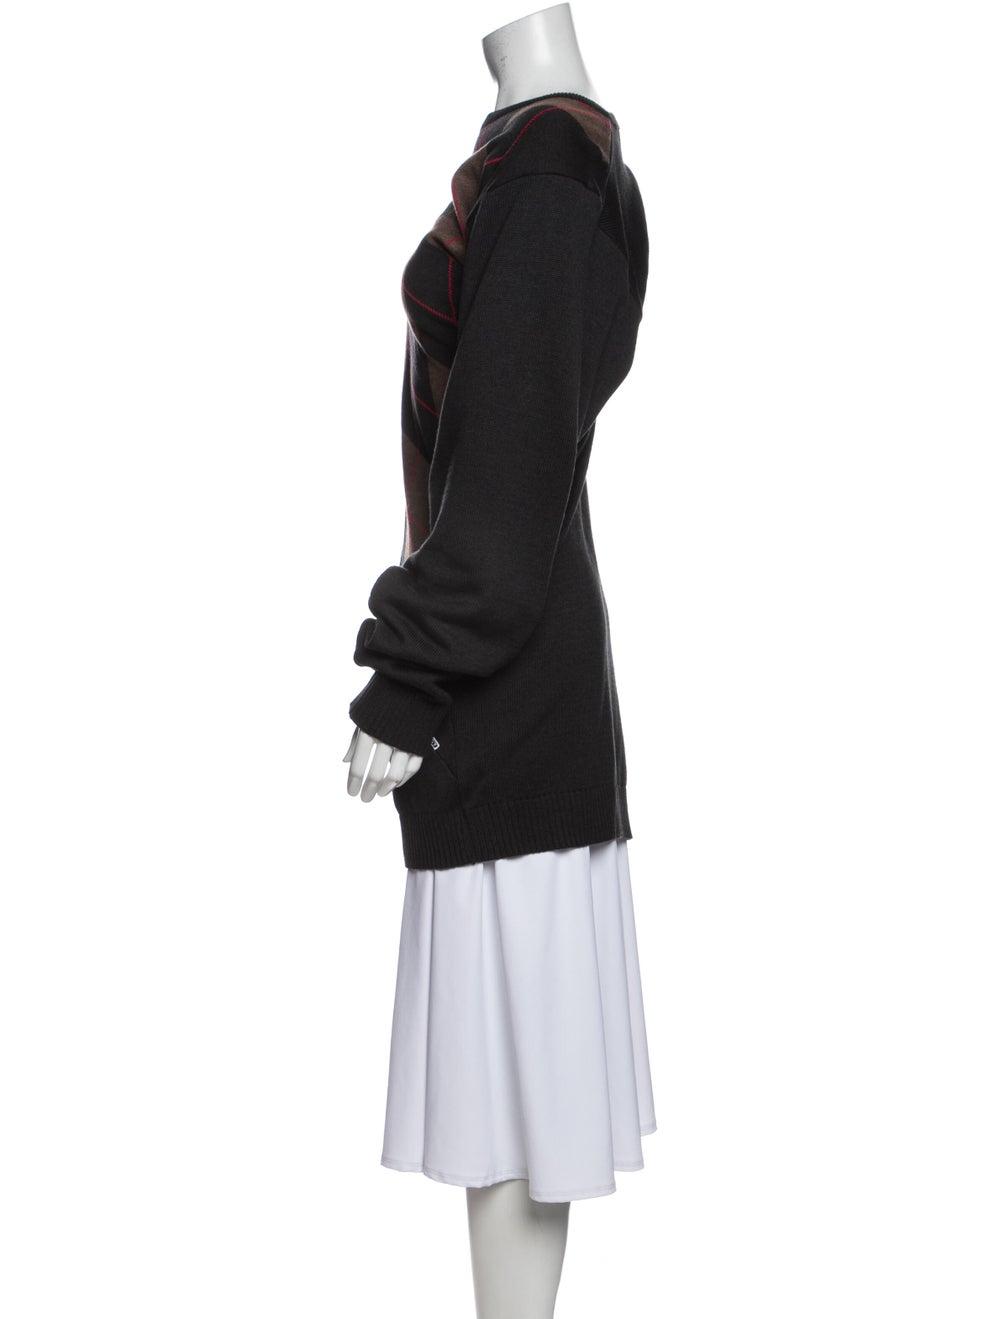 Y/Project Striped Bateau Neckline Sweater Black - image 2